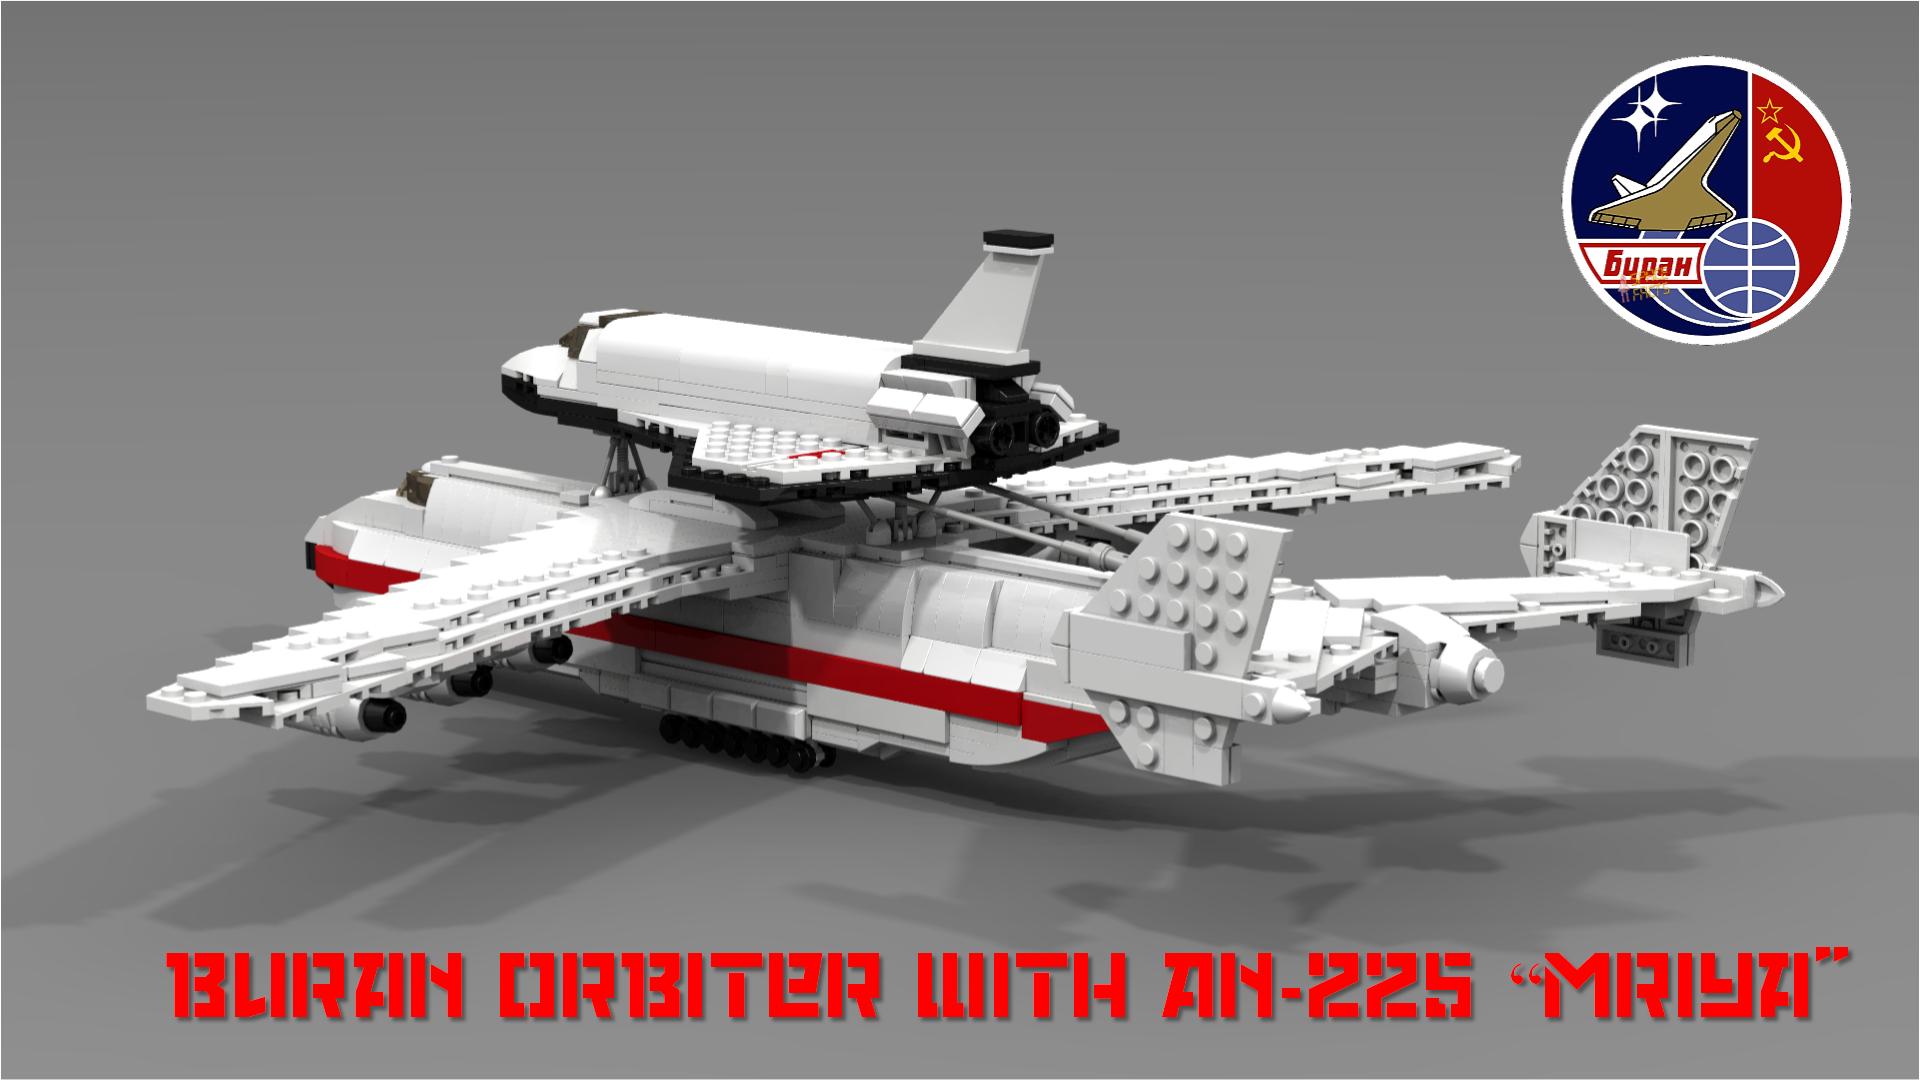 lego space shuttle orbiter - photo #11